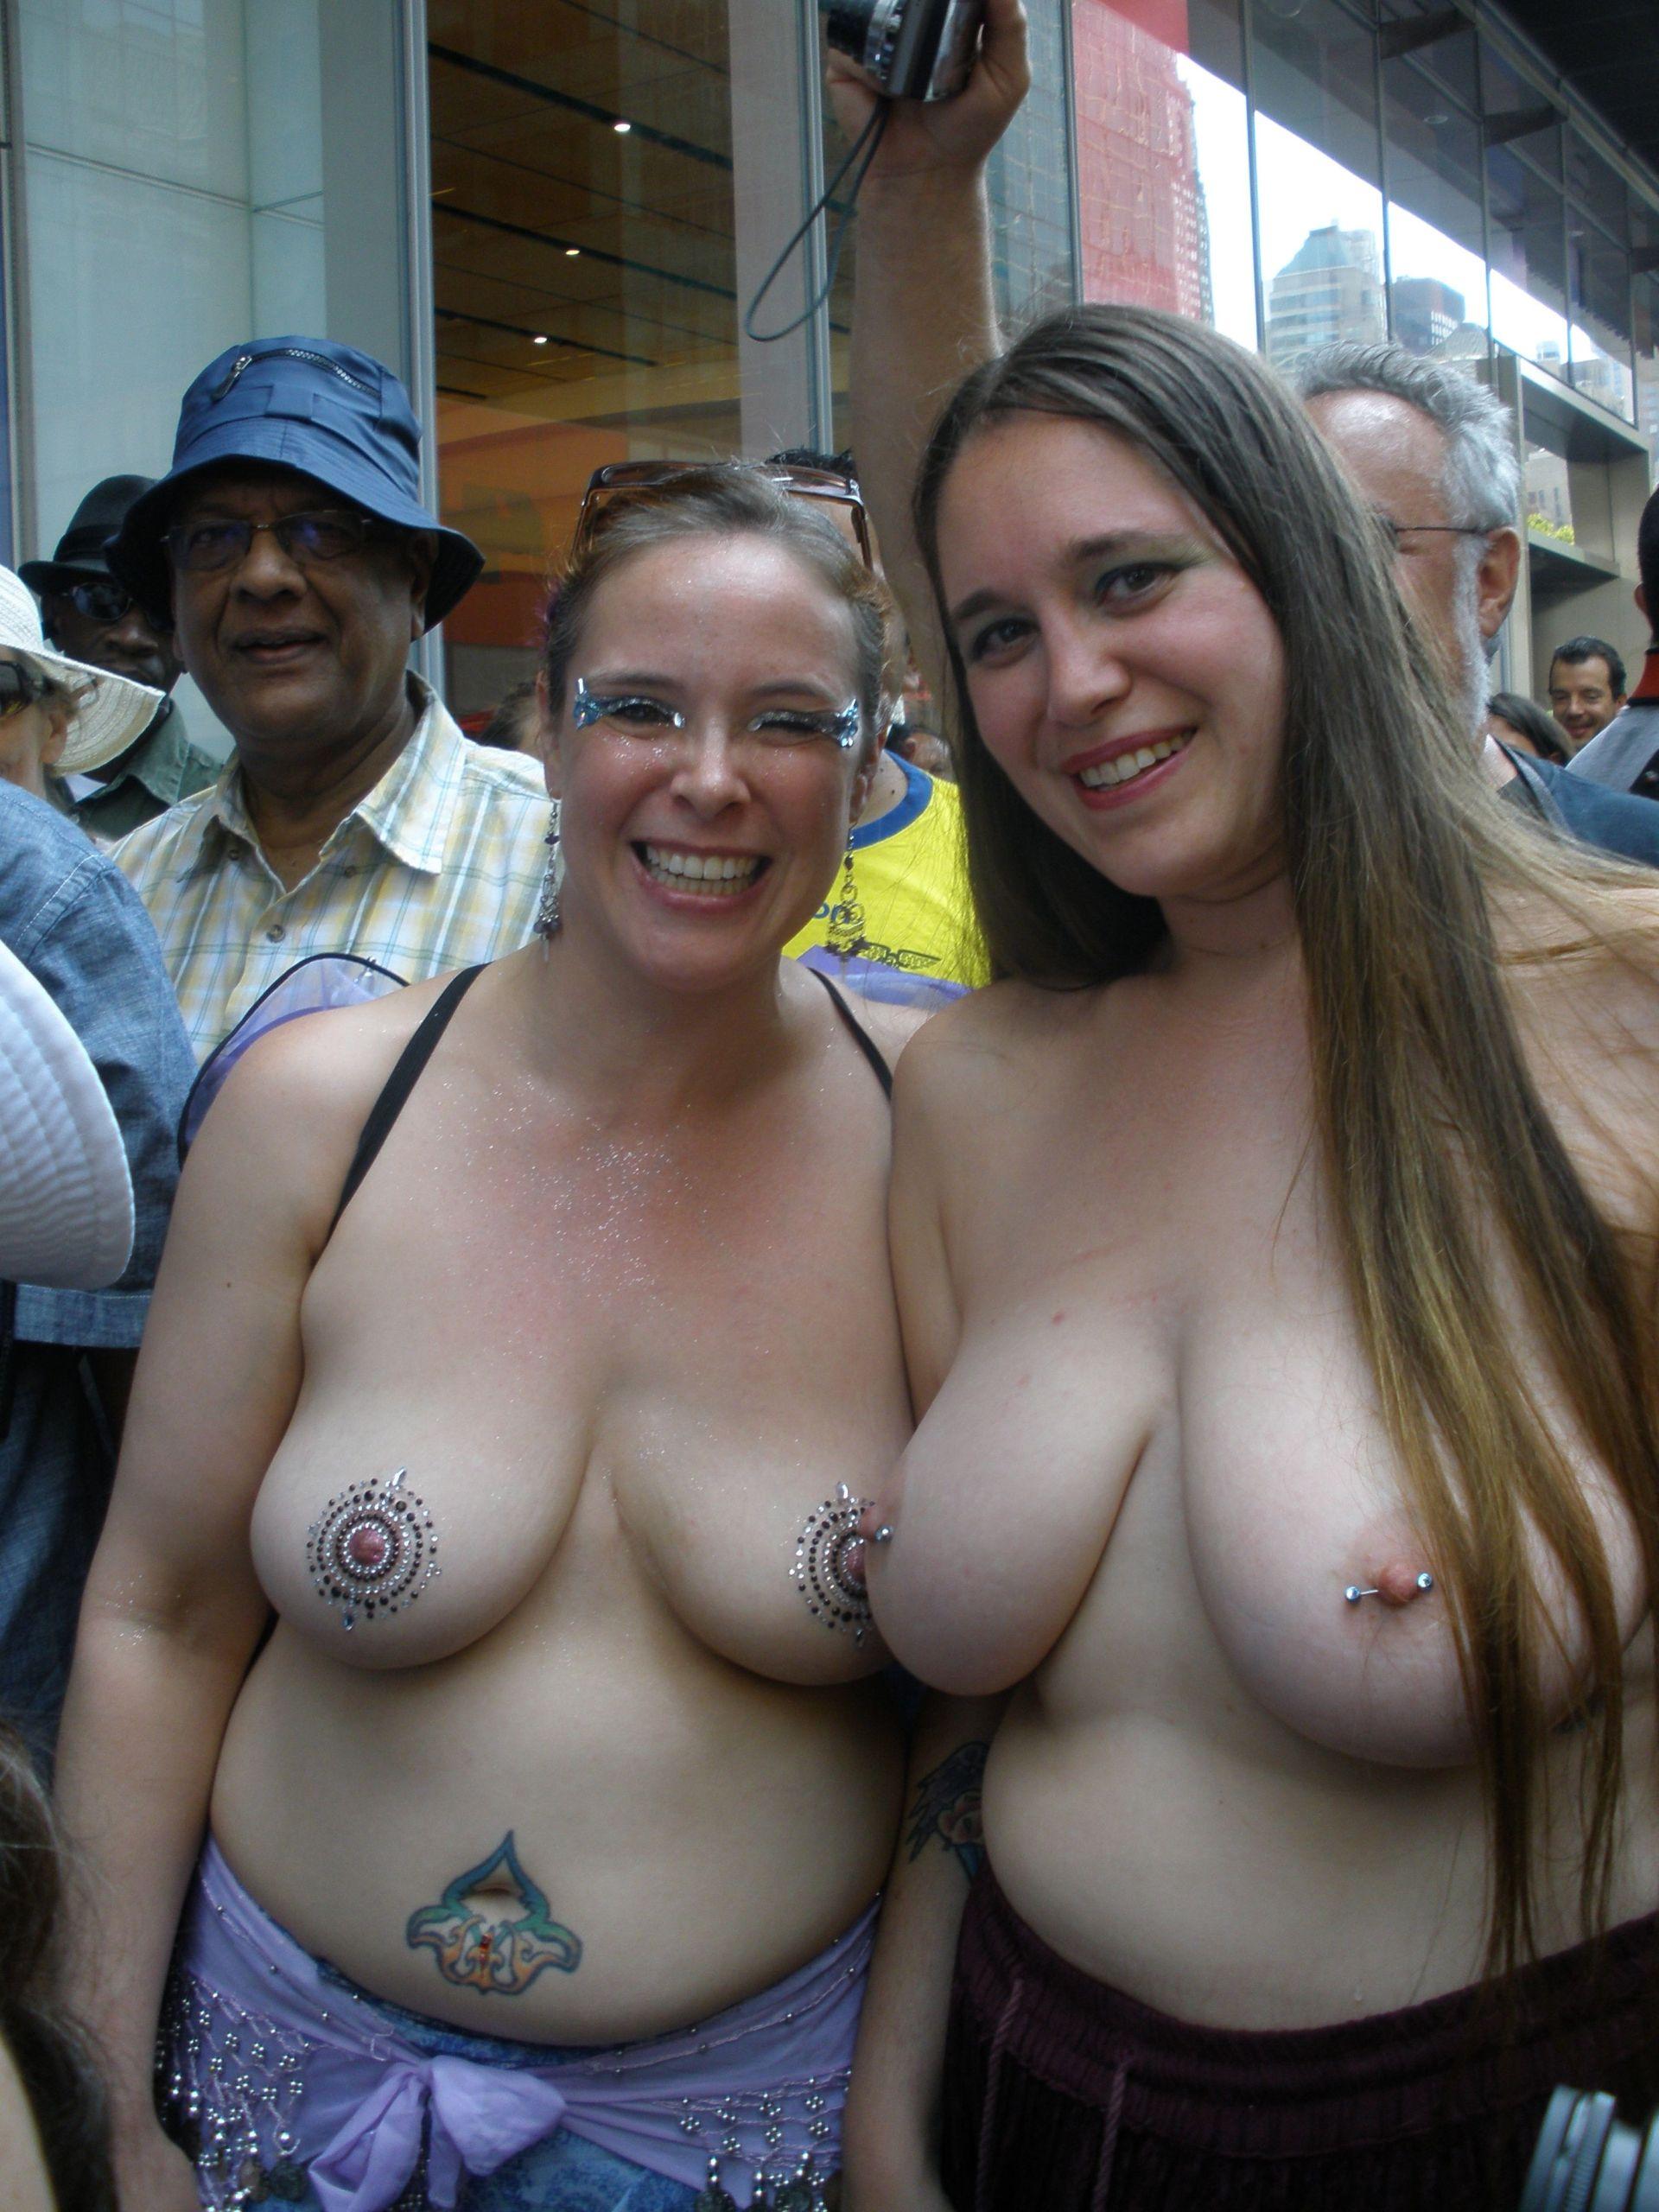 Girls Showing Their Boobs